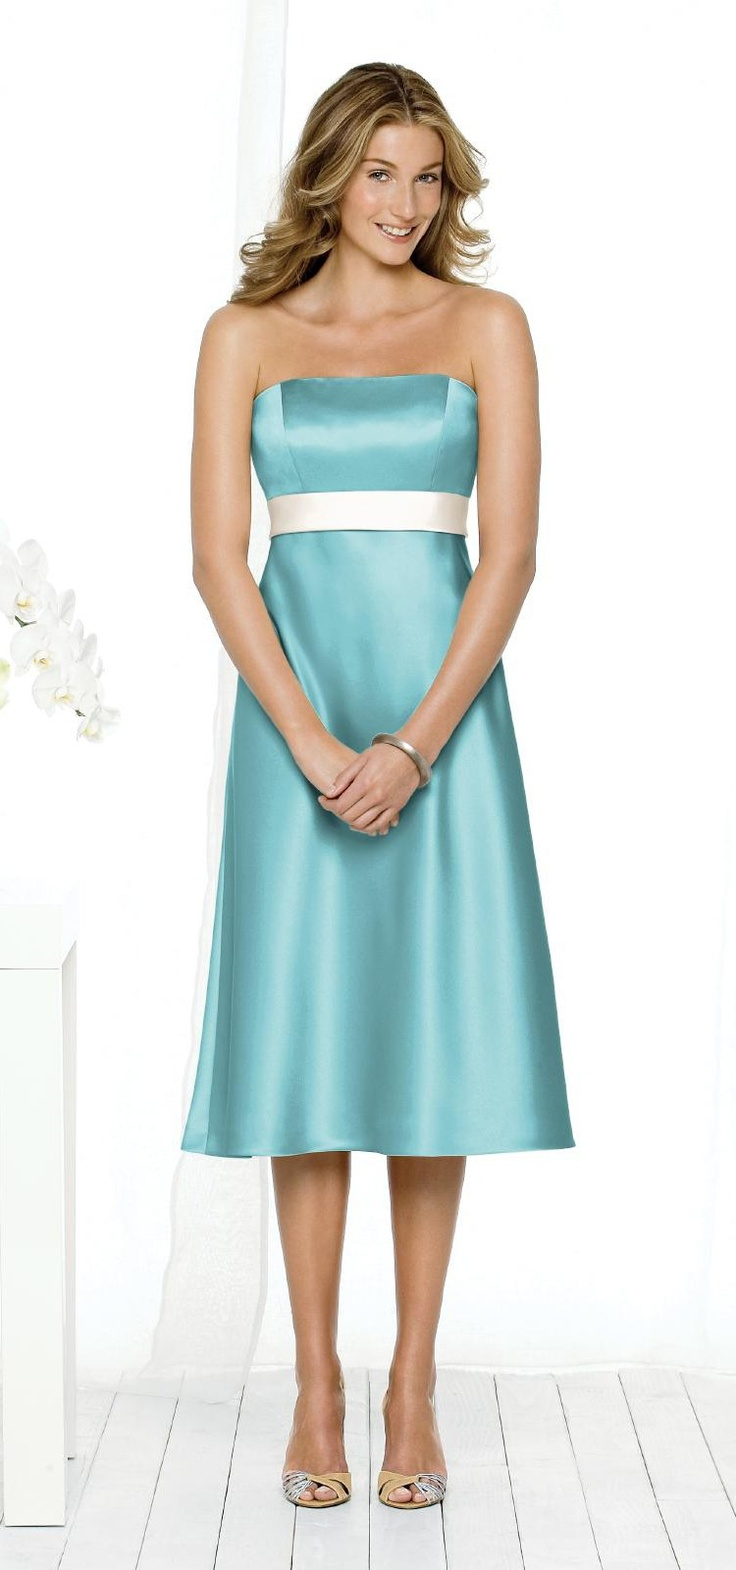 65 best Bridal party dresses images on Pinterest | Brides, Bridal ...